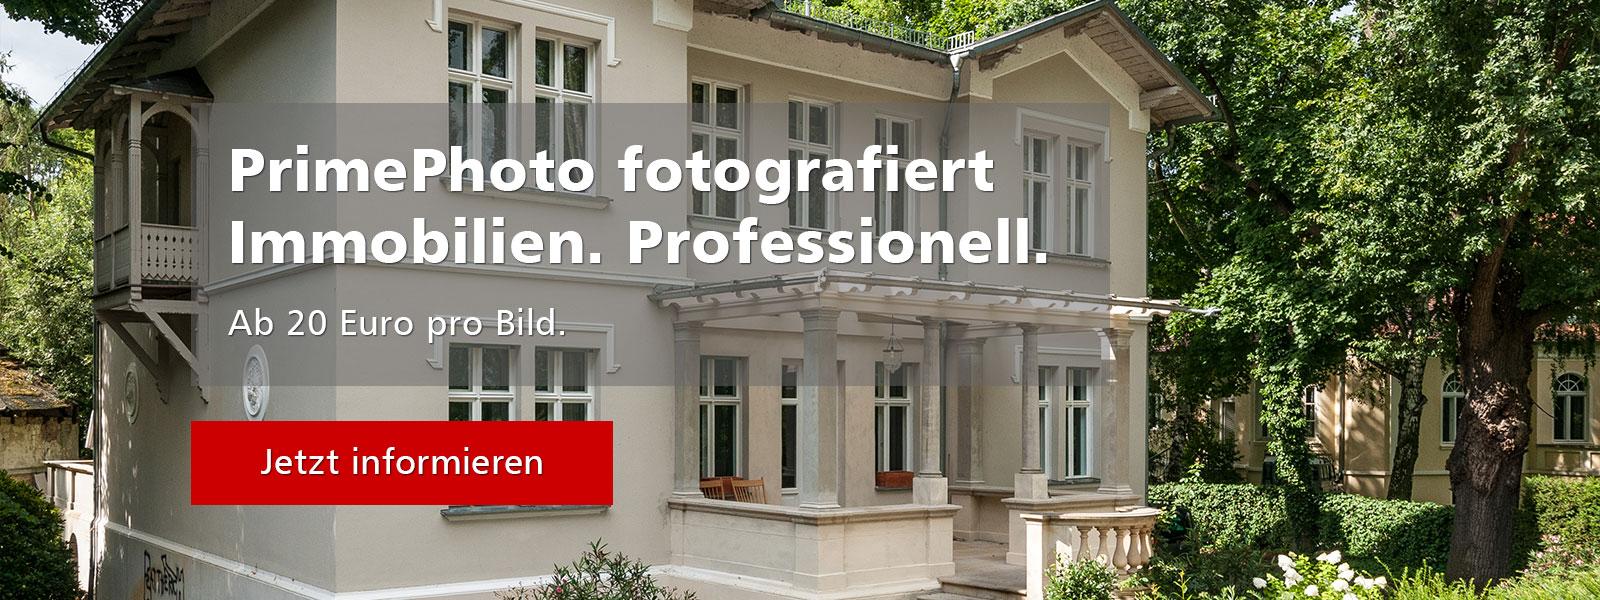 Professionelle Immobilienfotos ab 20 Euro pro Bild